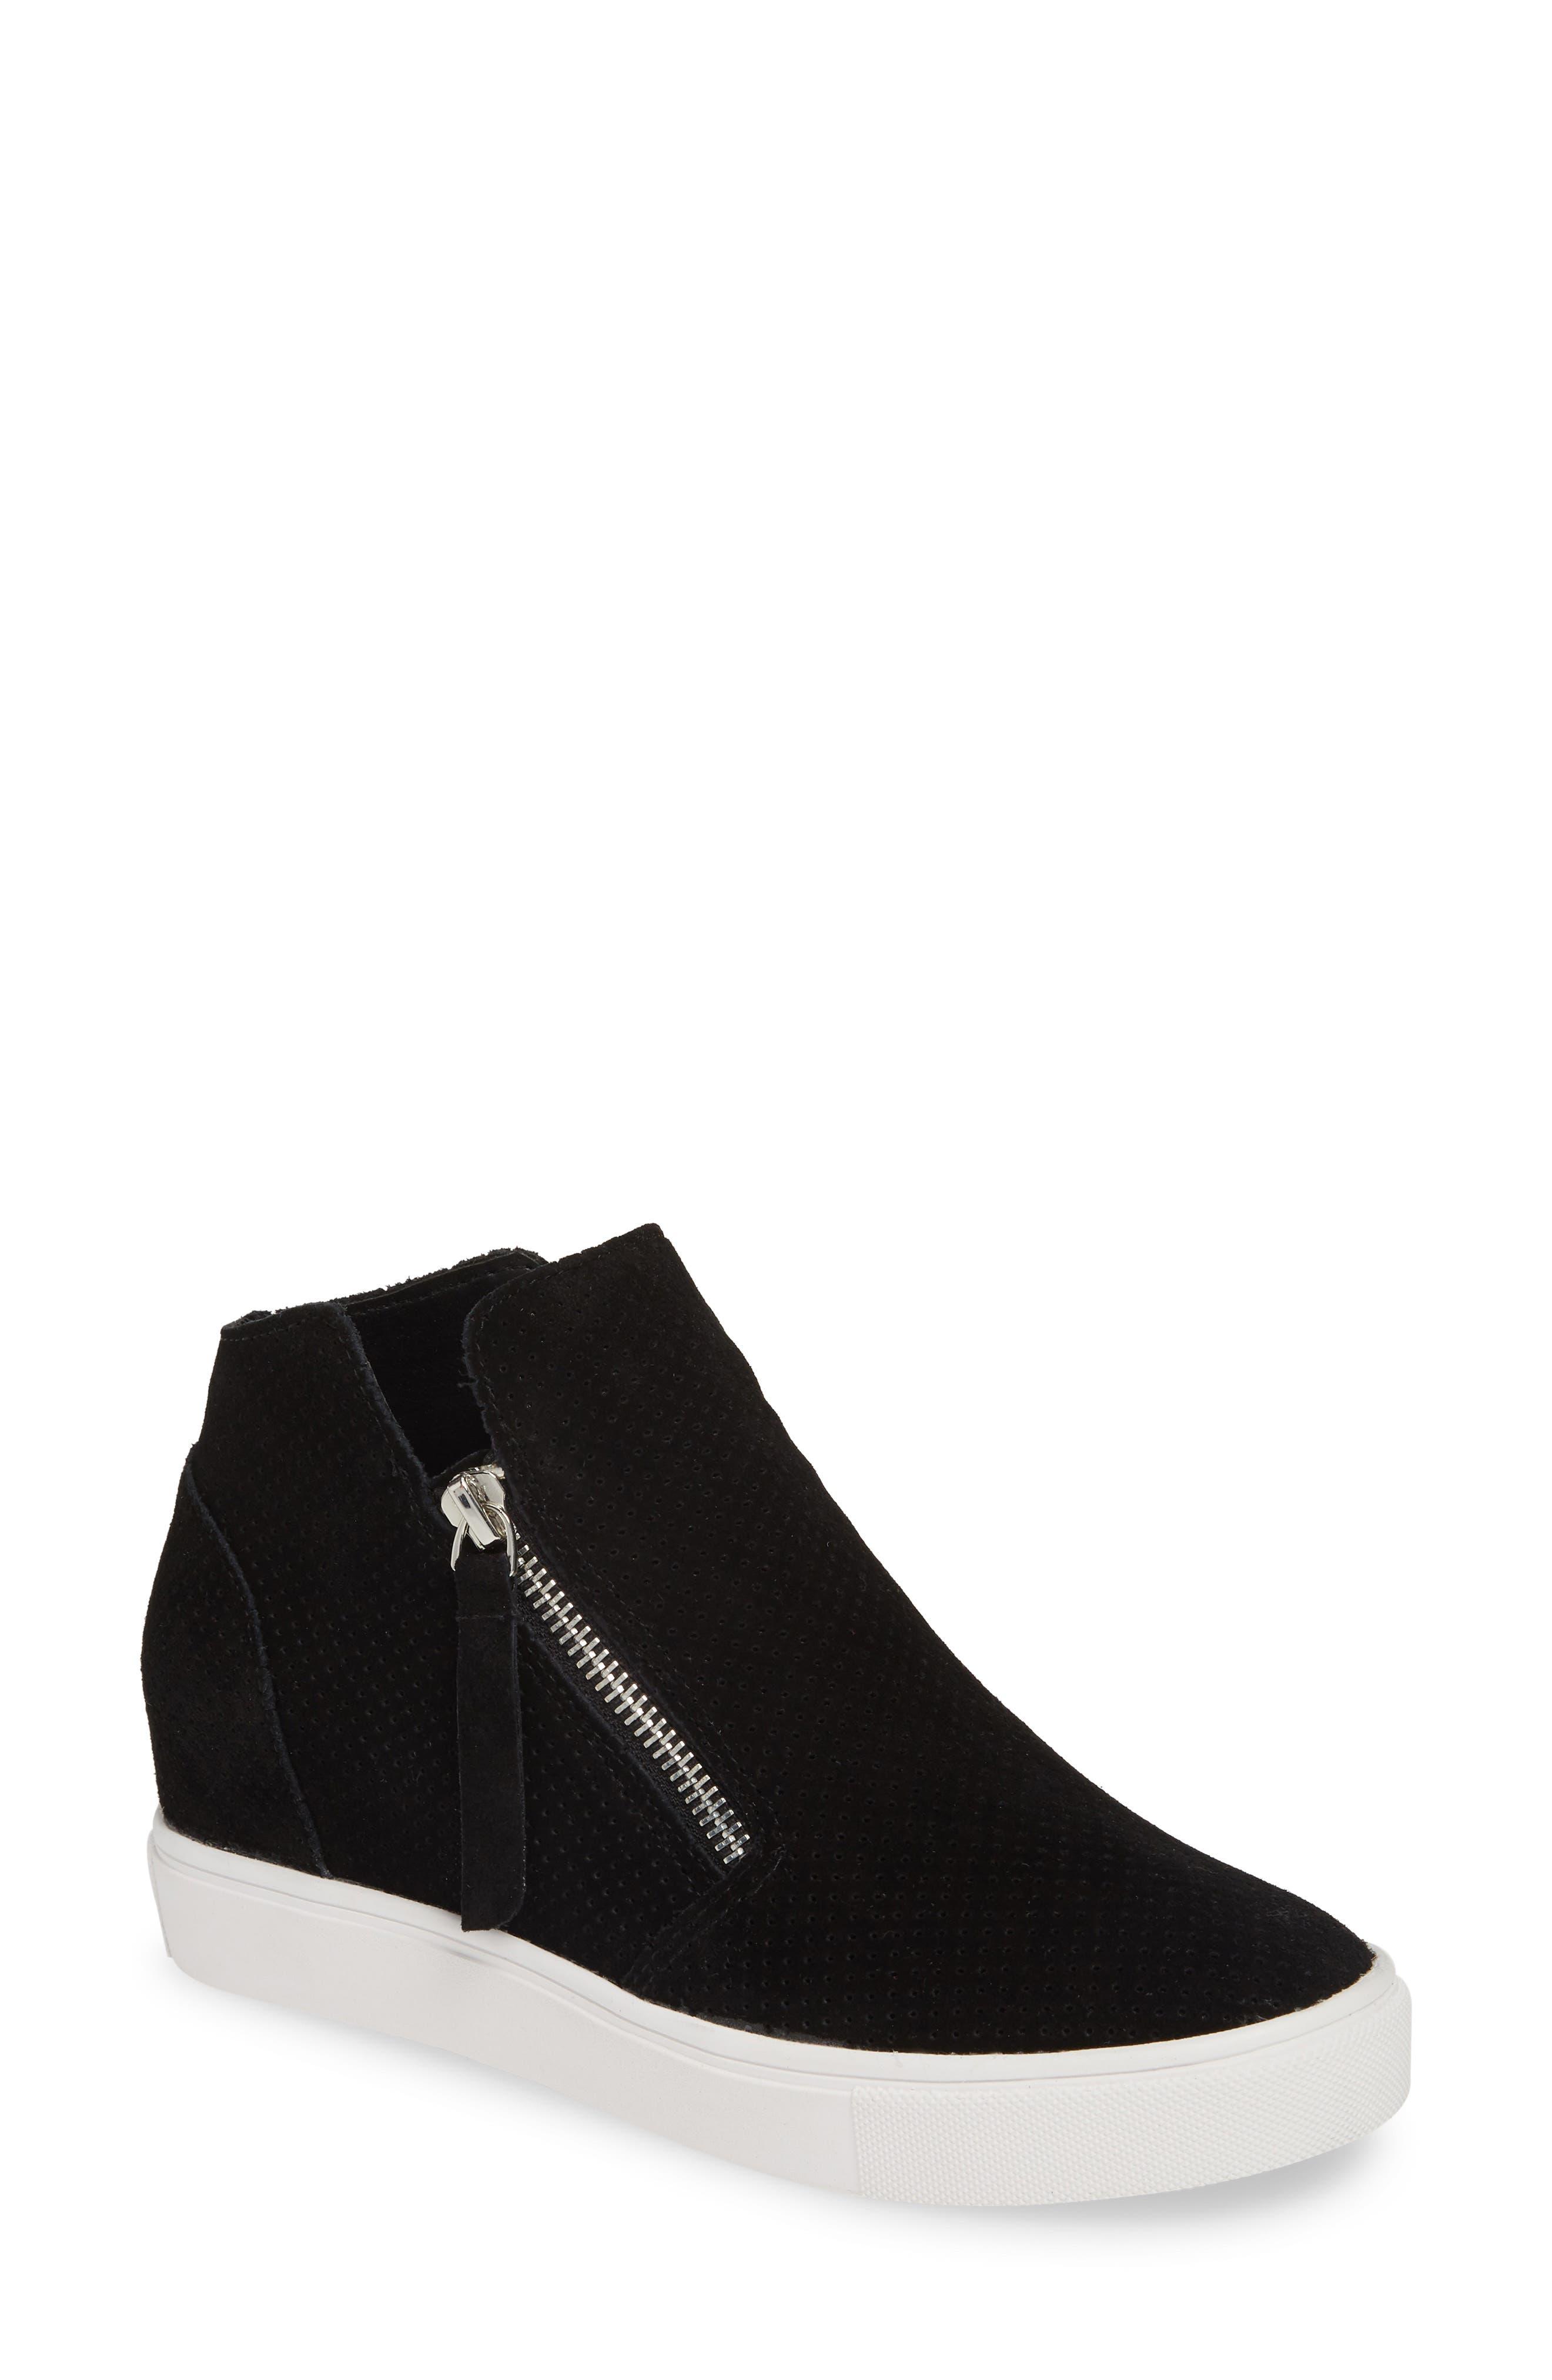 STEVE MADDEN Caliber High Top Sneaker, Main, color, BLACK SUEDE